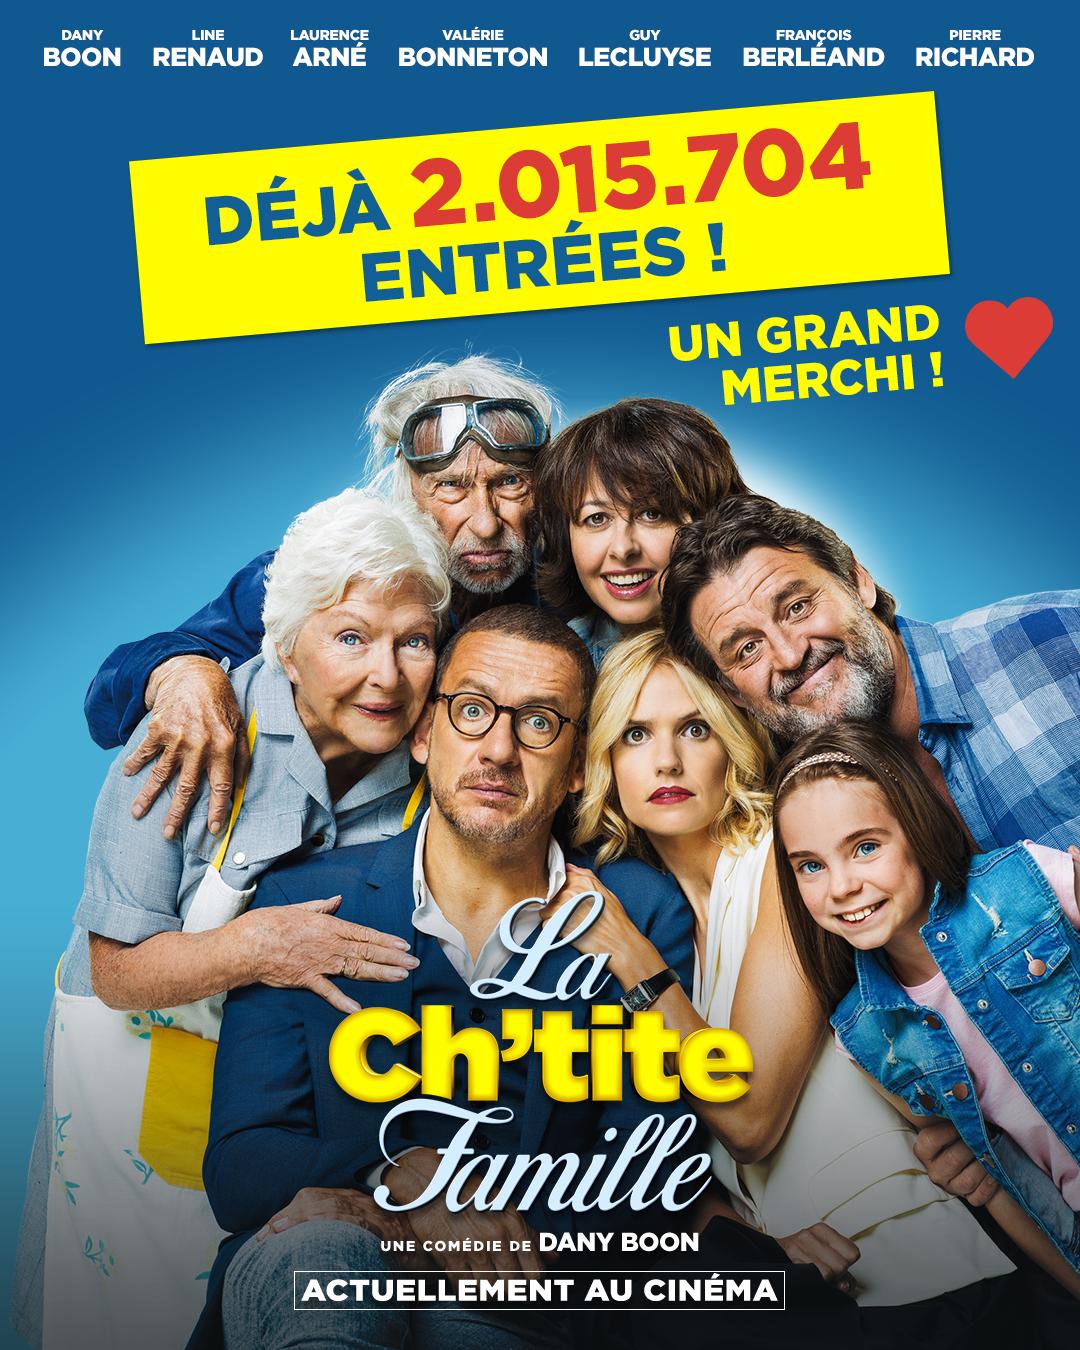 Streaming La Ch'tite Famille : streaming, ch'tite, famille, Ch'tite, Famille, #DanyBoon, N'est, Petite, ça..., Films, Streaming, Gratuit,, Français,, Complets, Gratuits